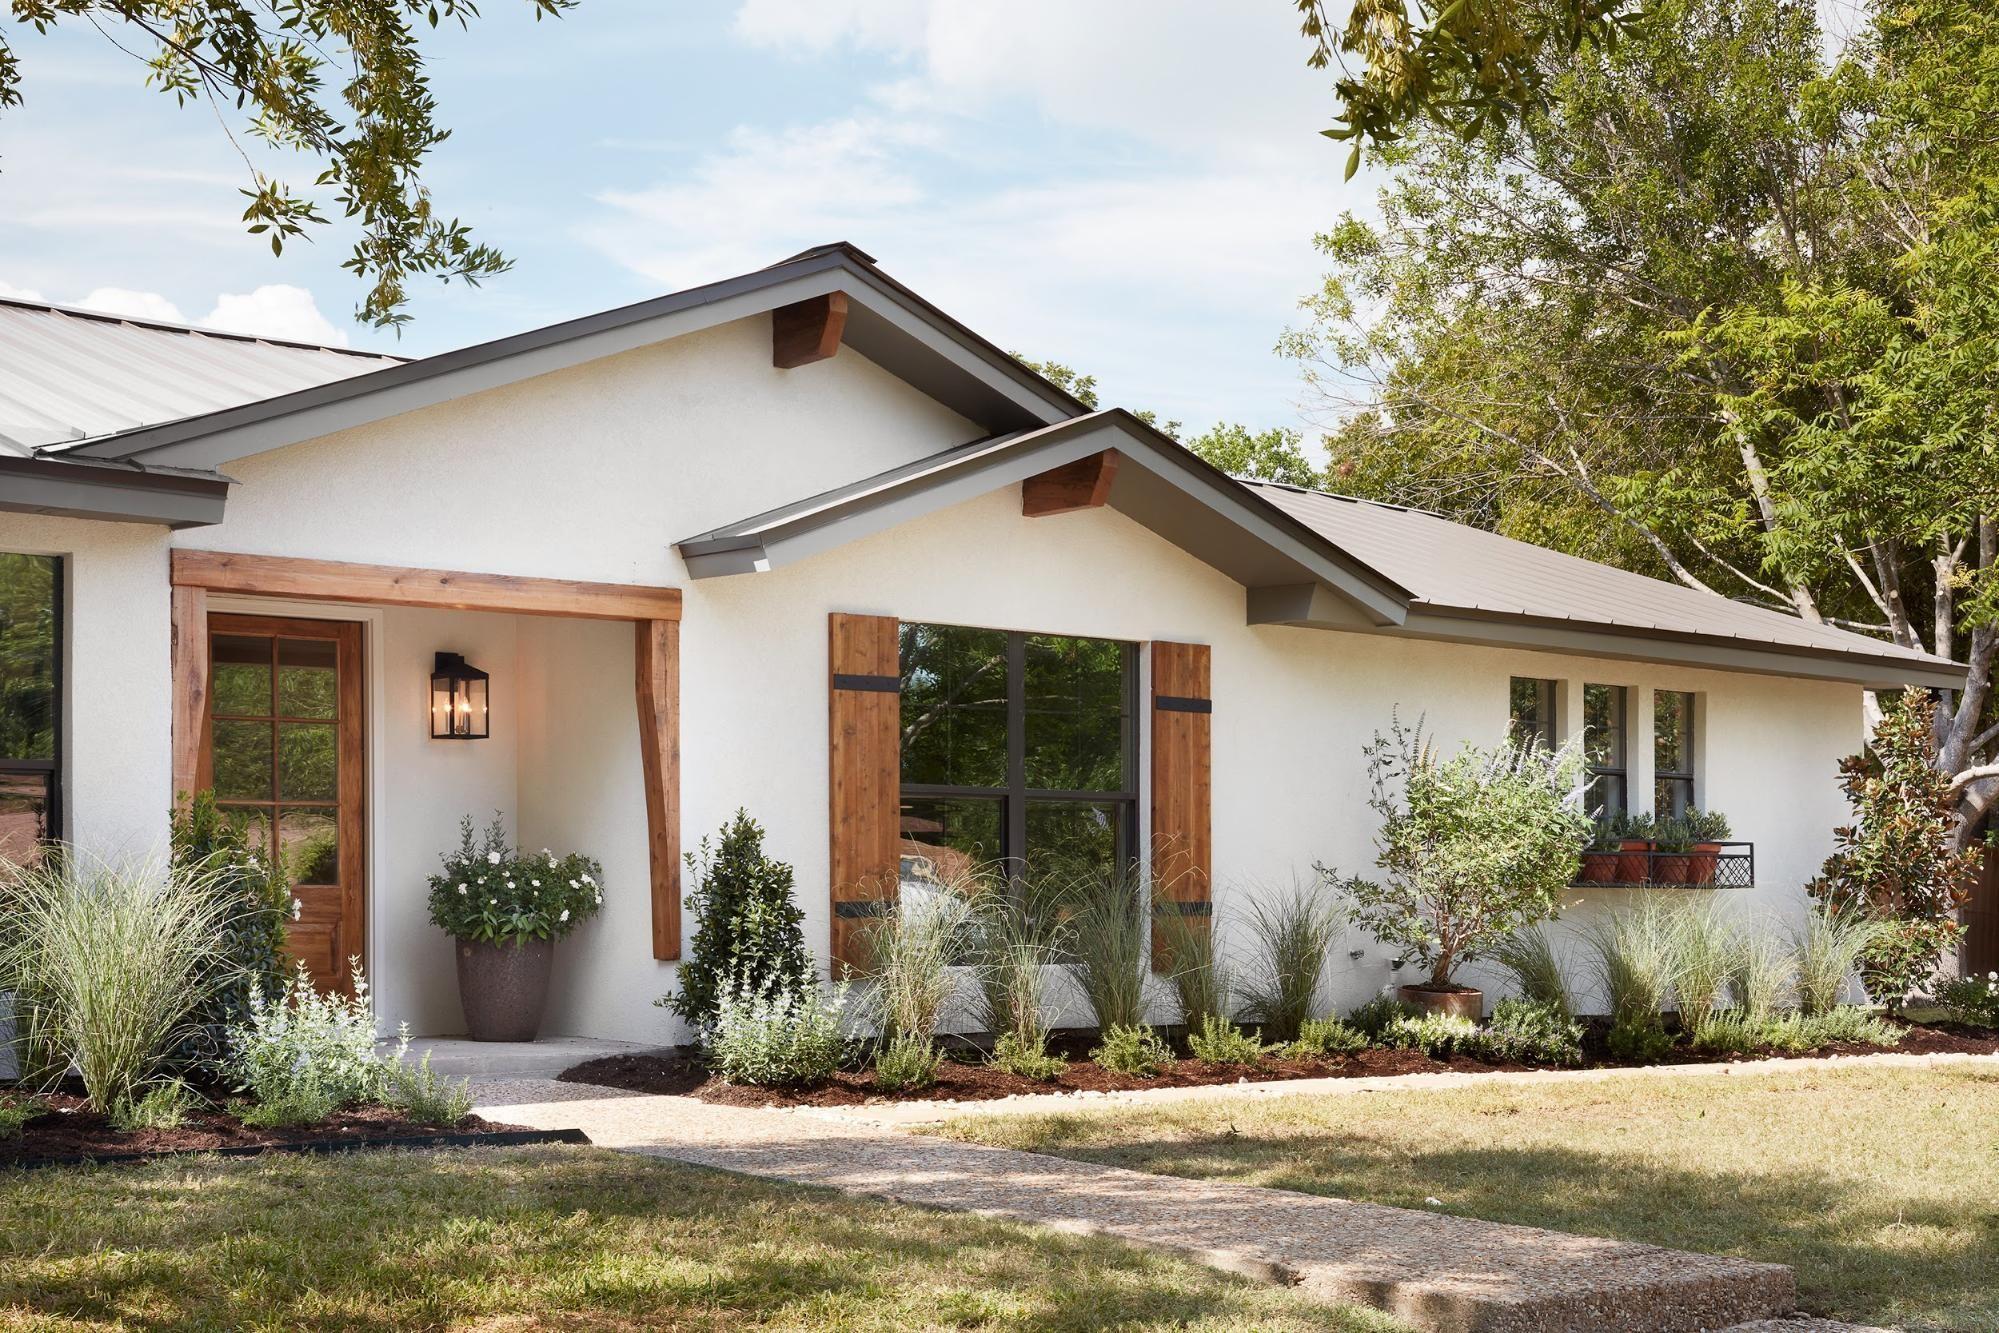 Episode 5 Season 5 Hgtv S Fixer Upper Chip Jo Gaines Ranch House Exterior Home Exterior Makeover Exterior House Colors